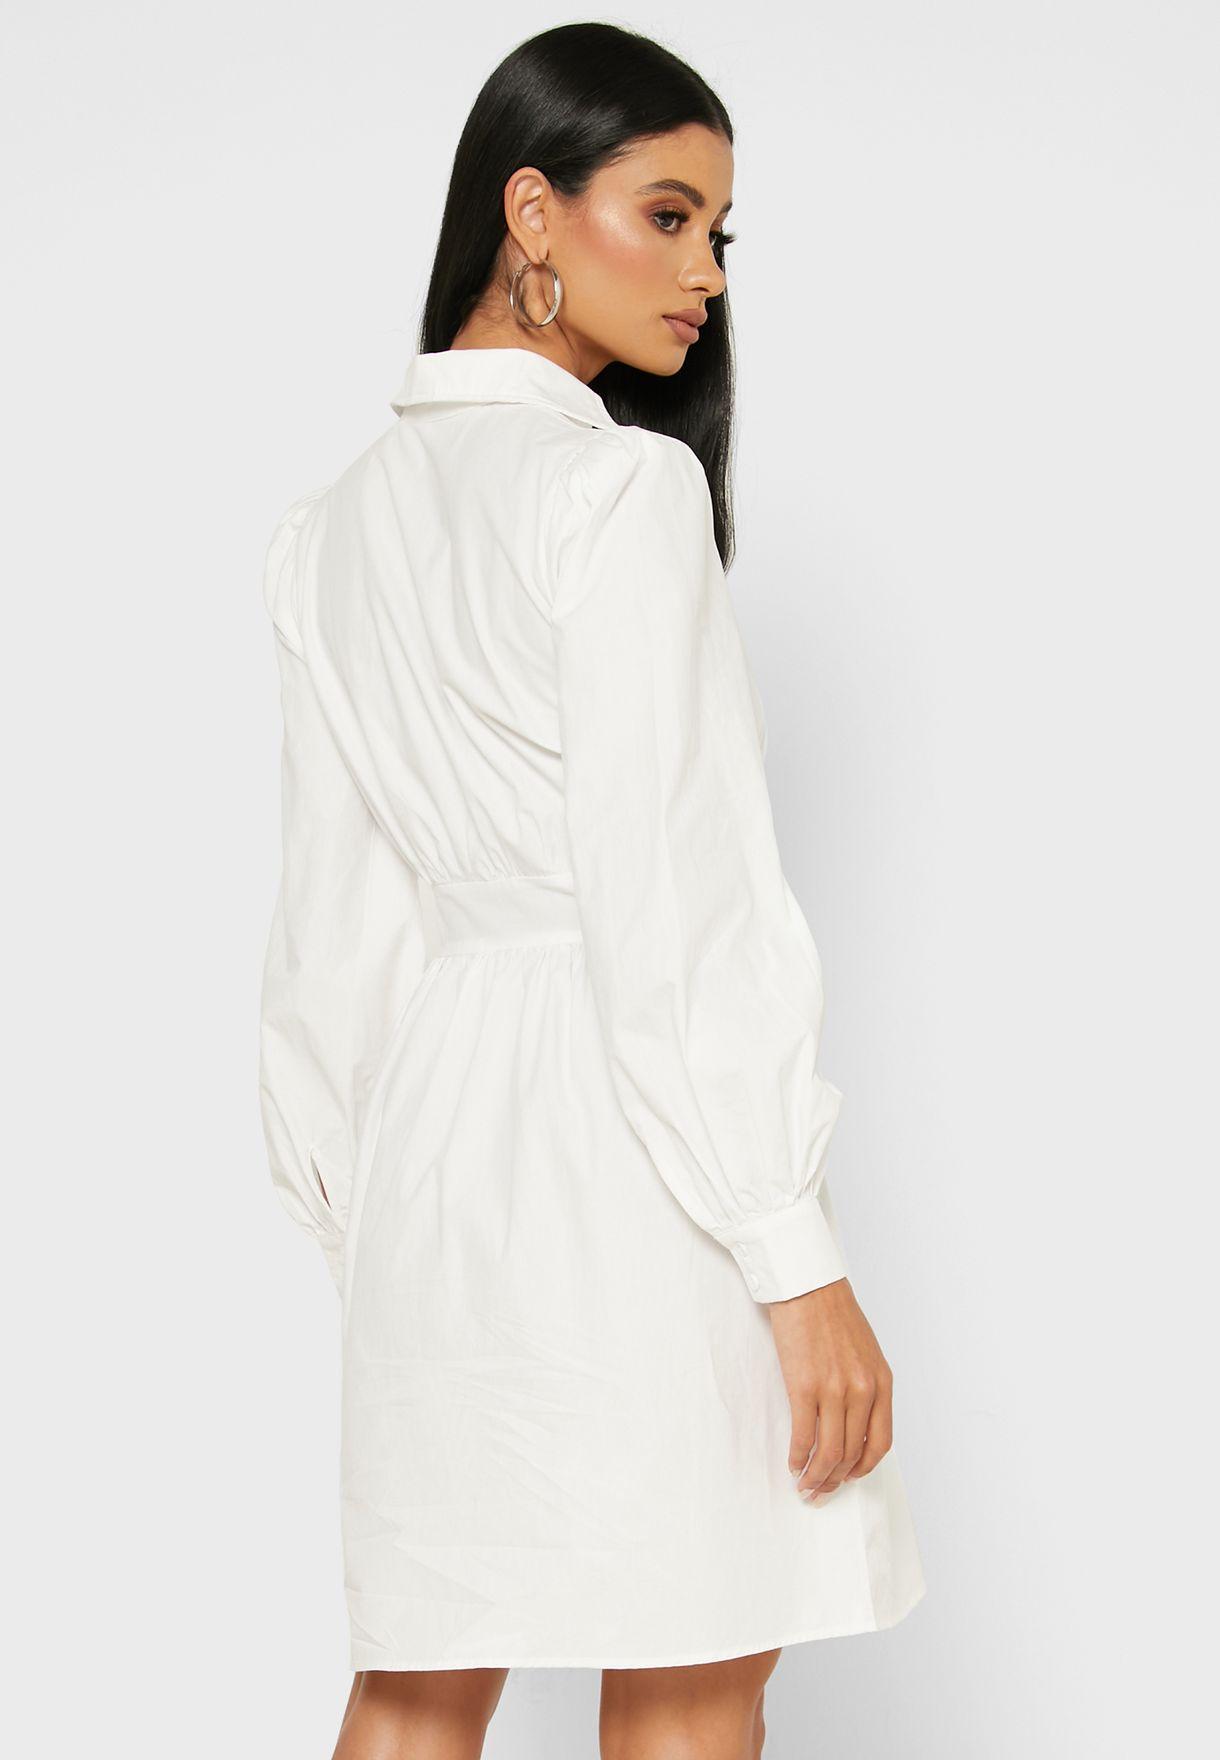 Puffed Sleeve Shirt Mini Dress